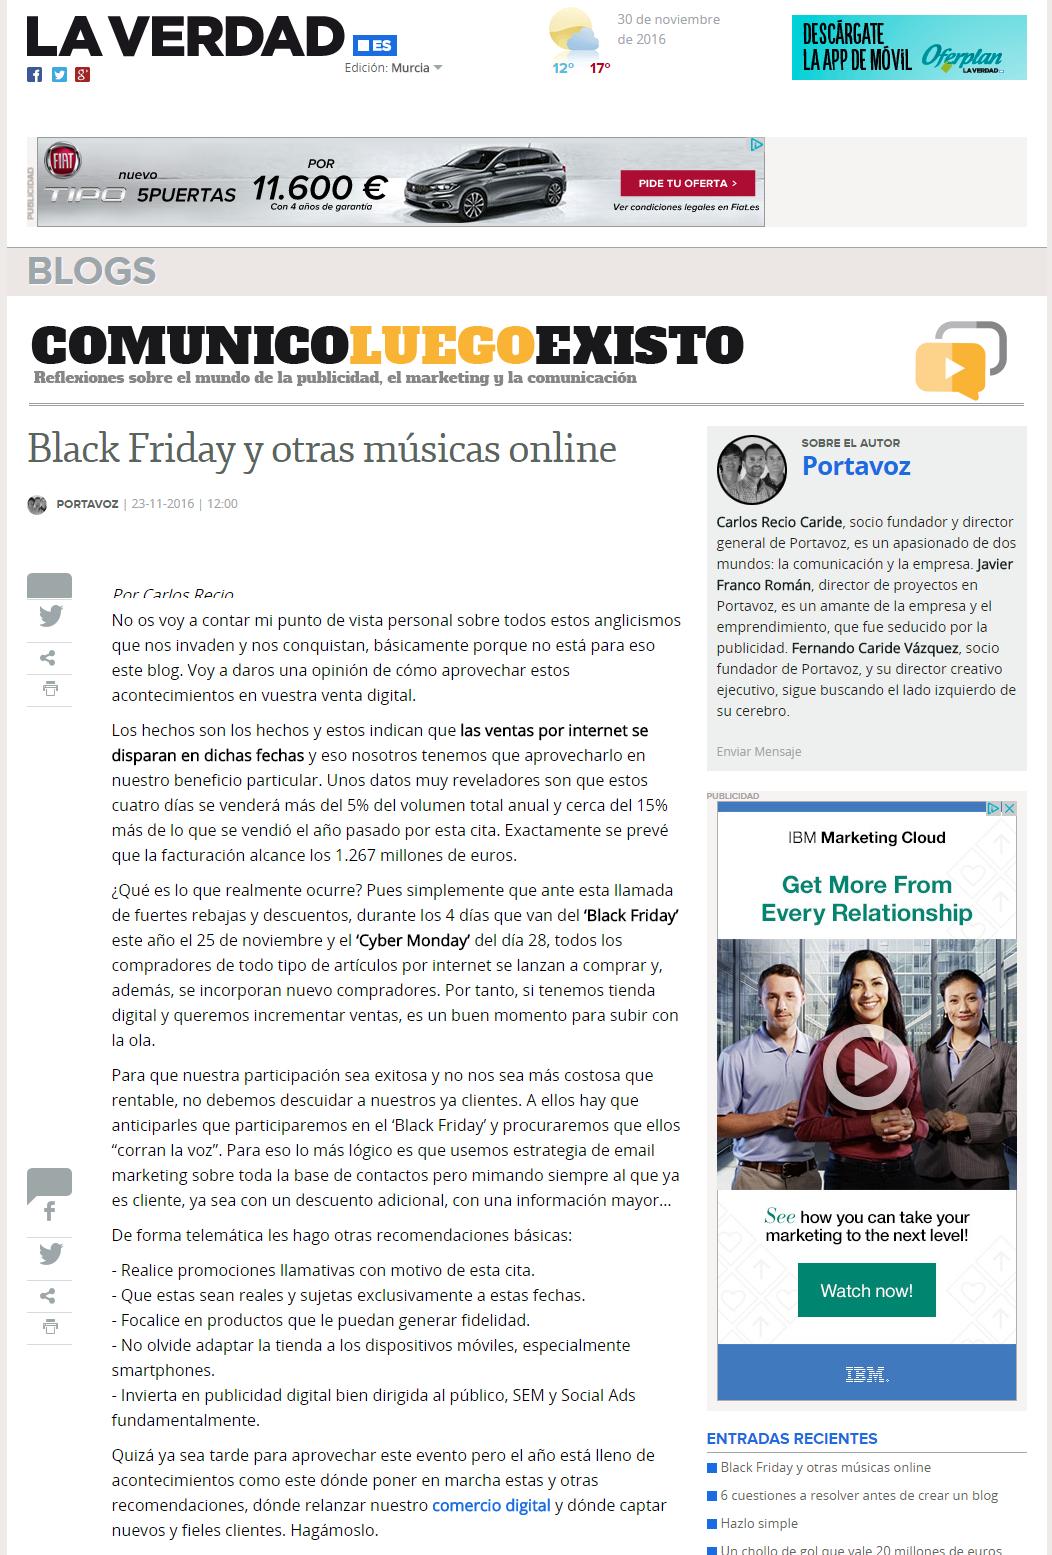 2016-11-30blogs-laverdad-es